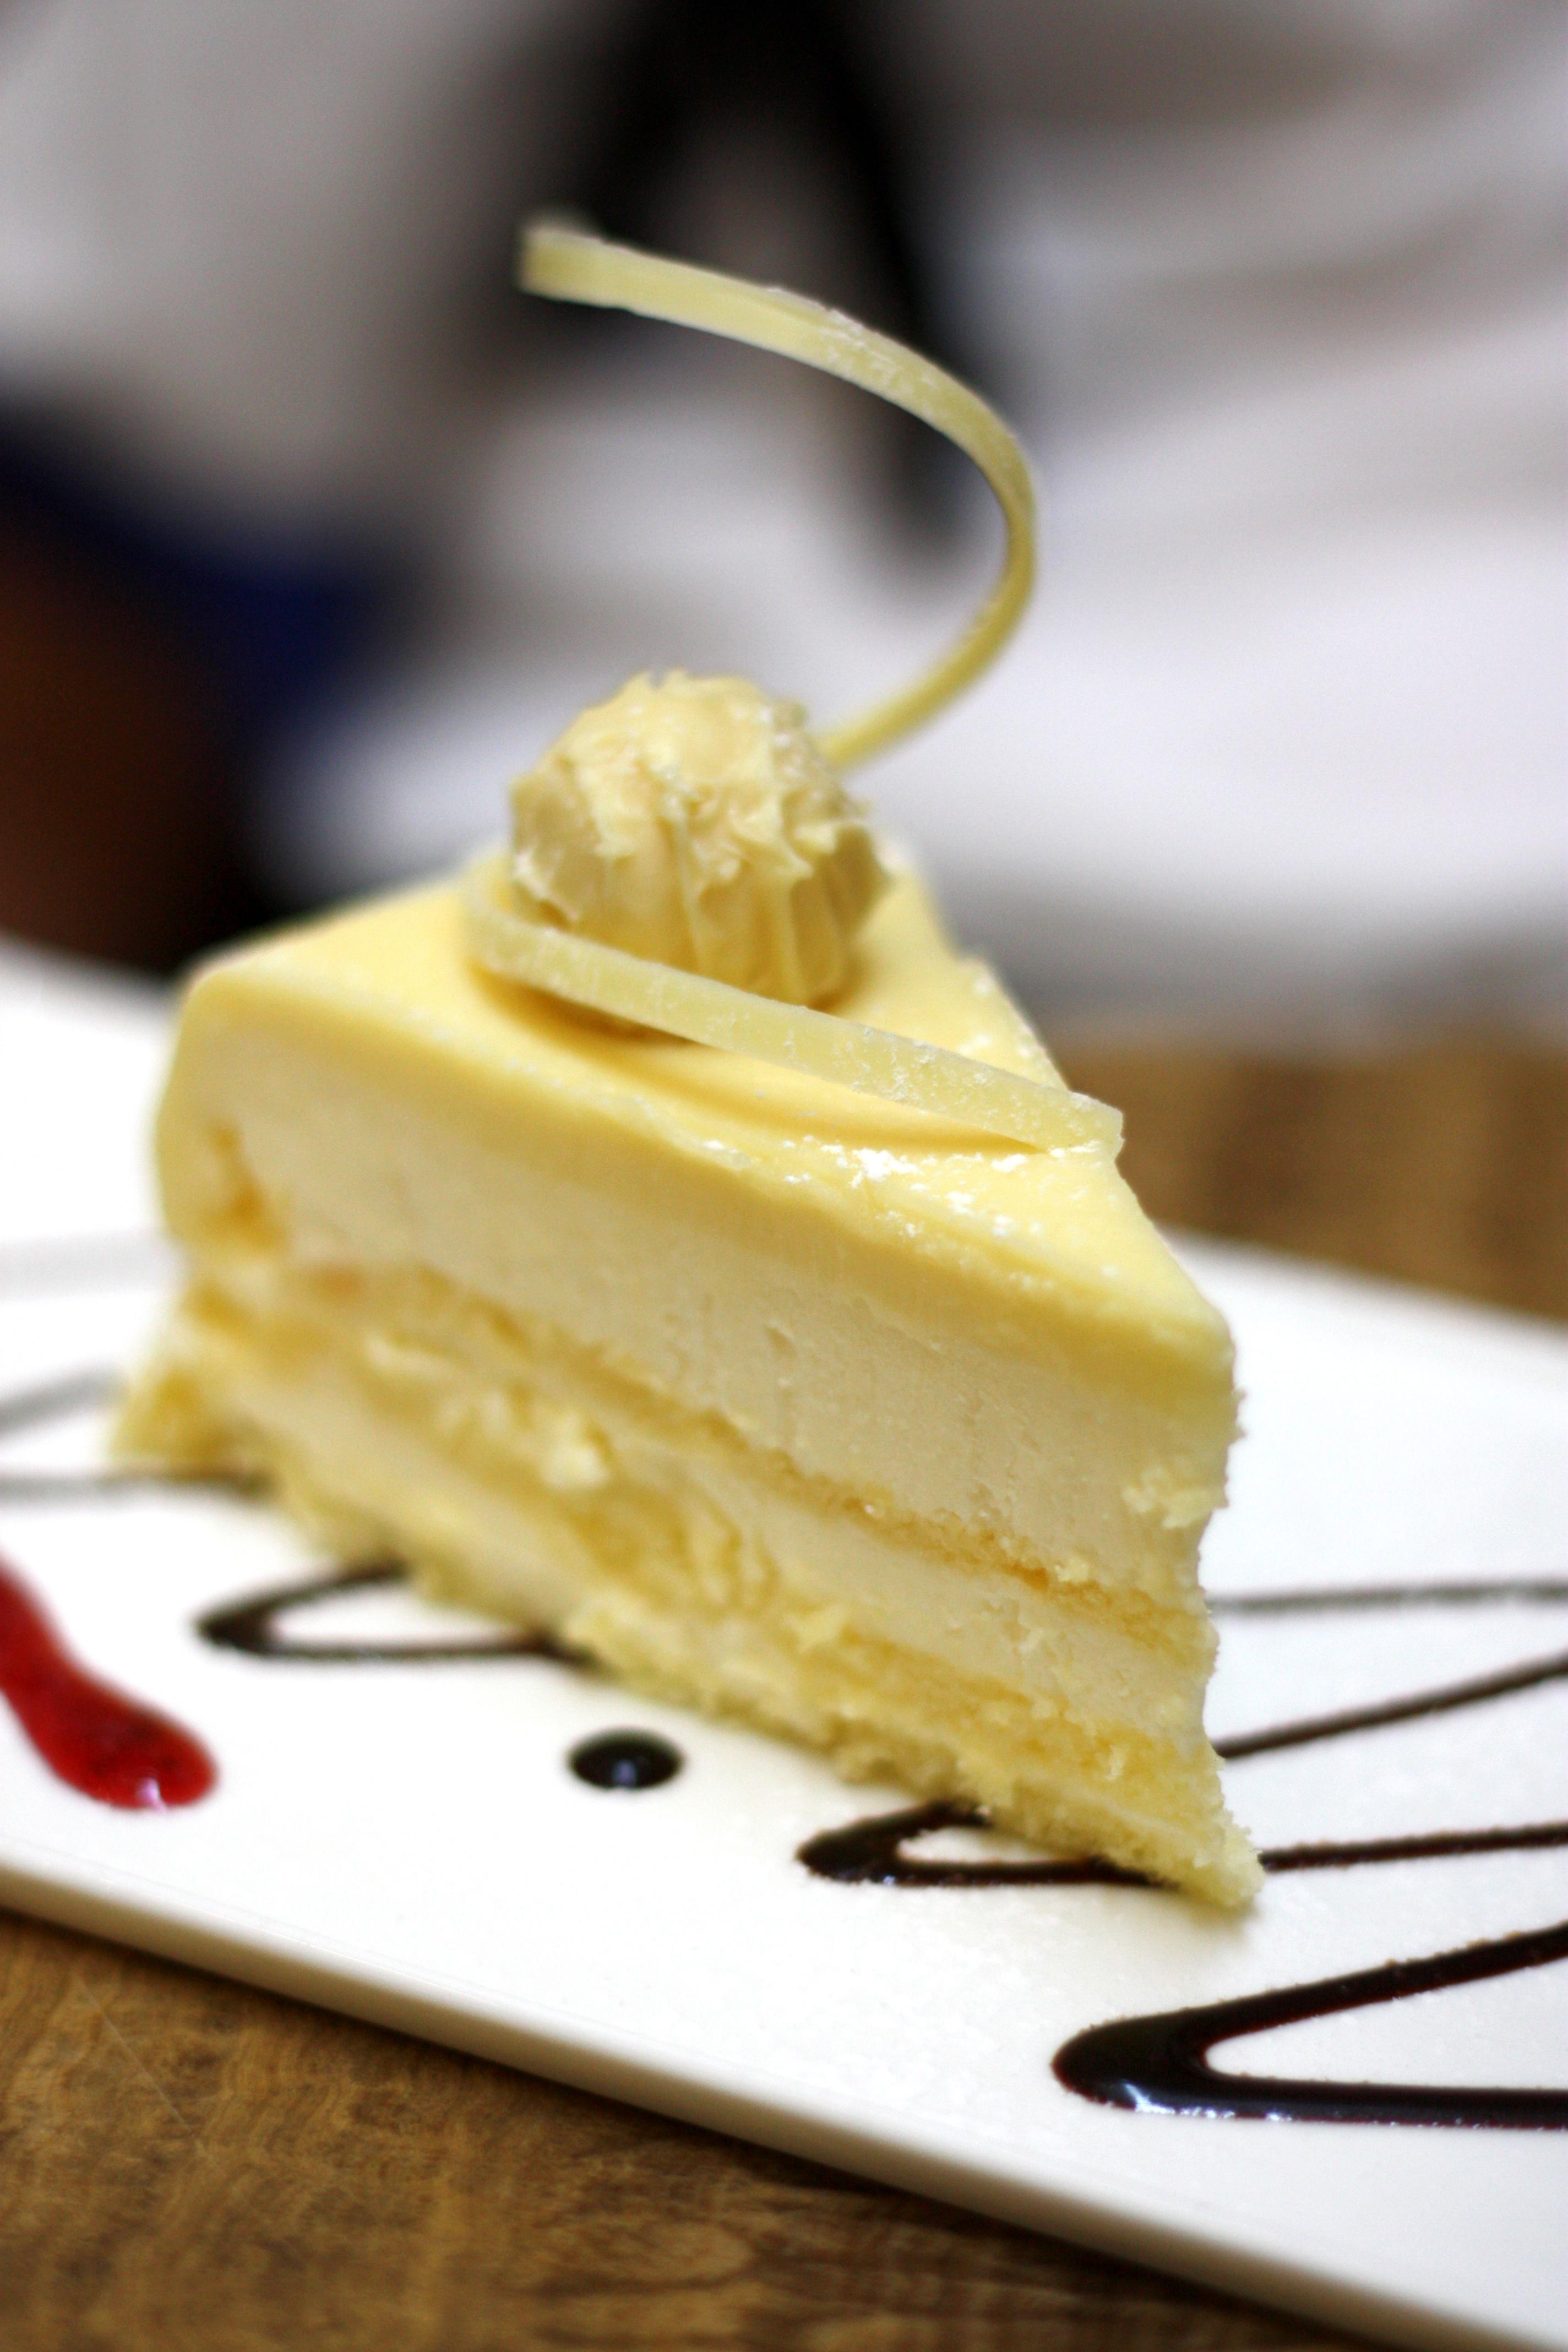 Slice The Cake Kow Otani S Castle In The Sky Lyrics